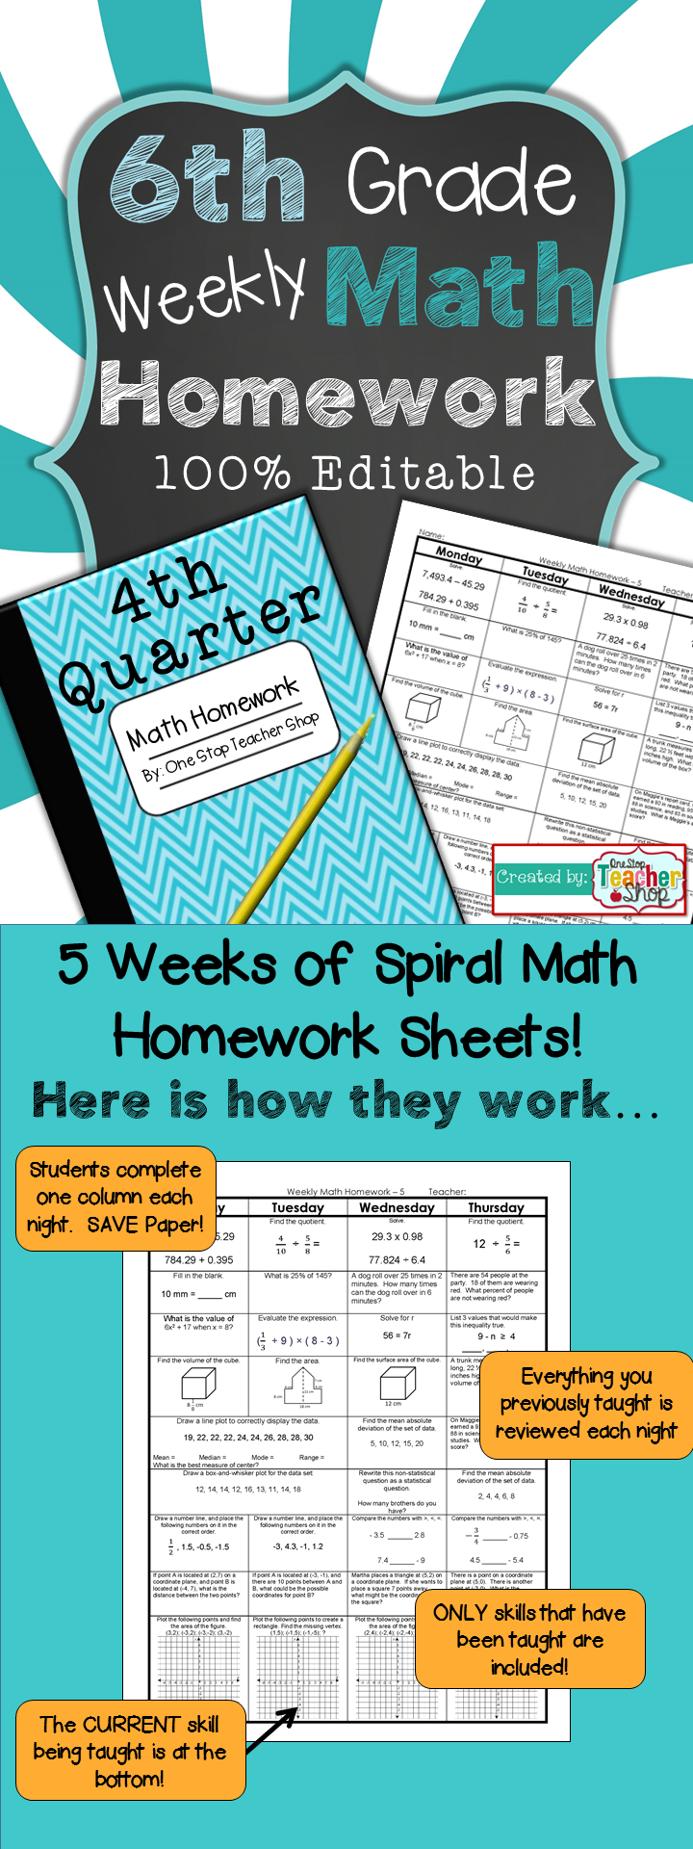 Homework help for 6th grade math